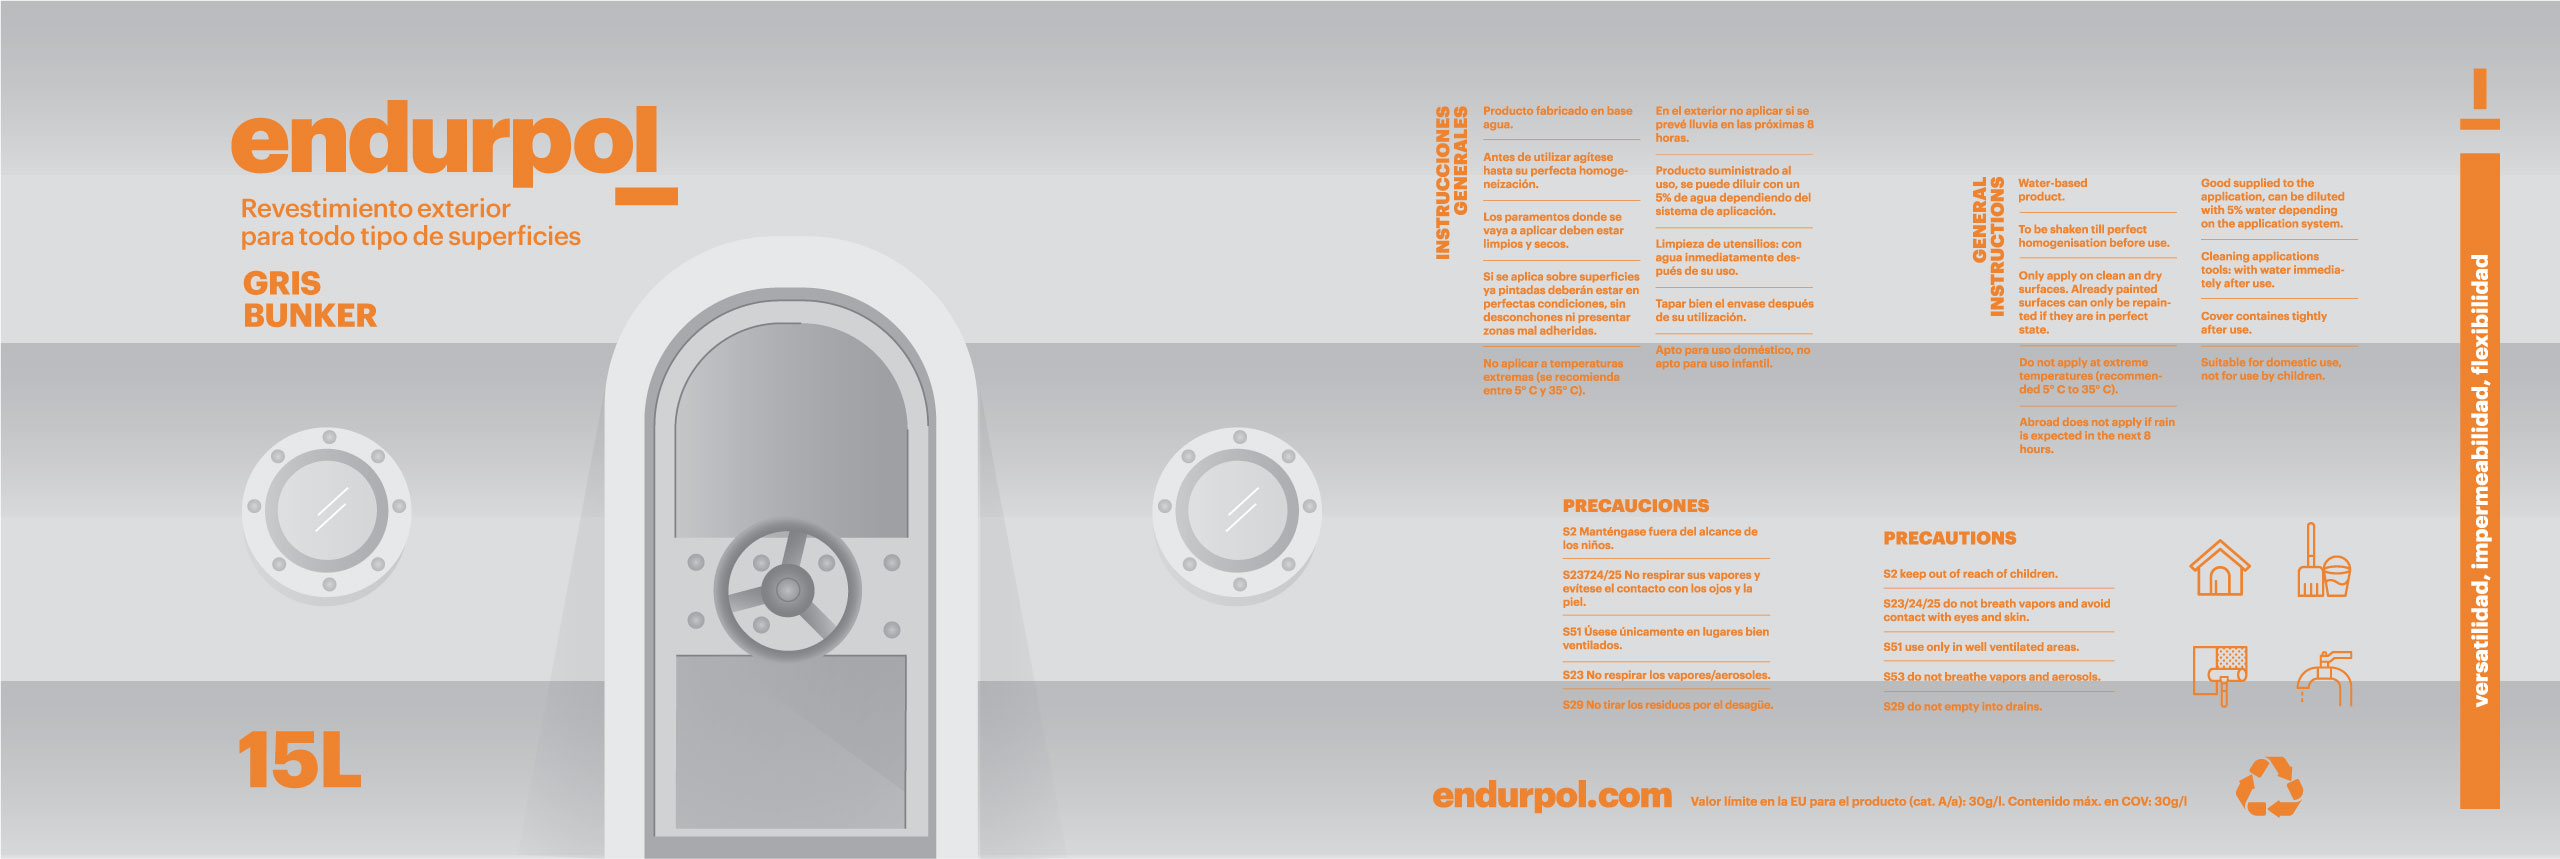 marinagoni-endurpol-design-label